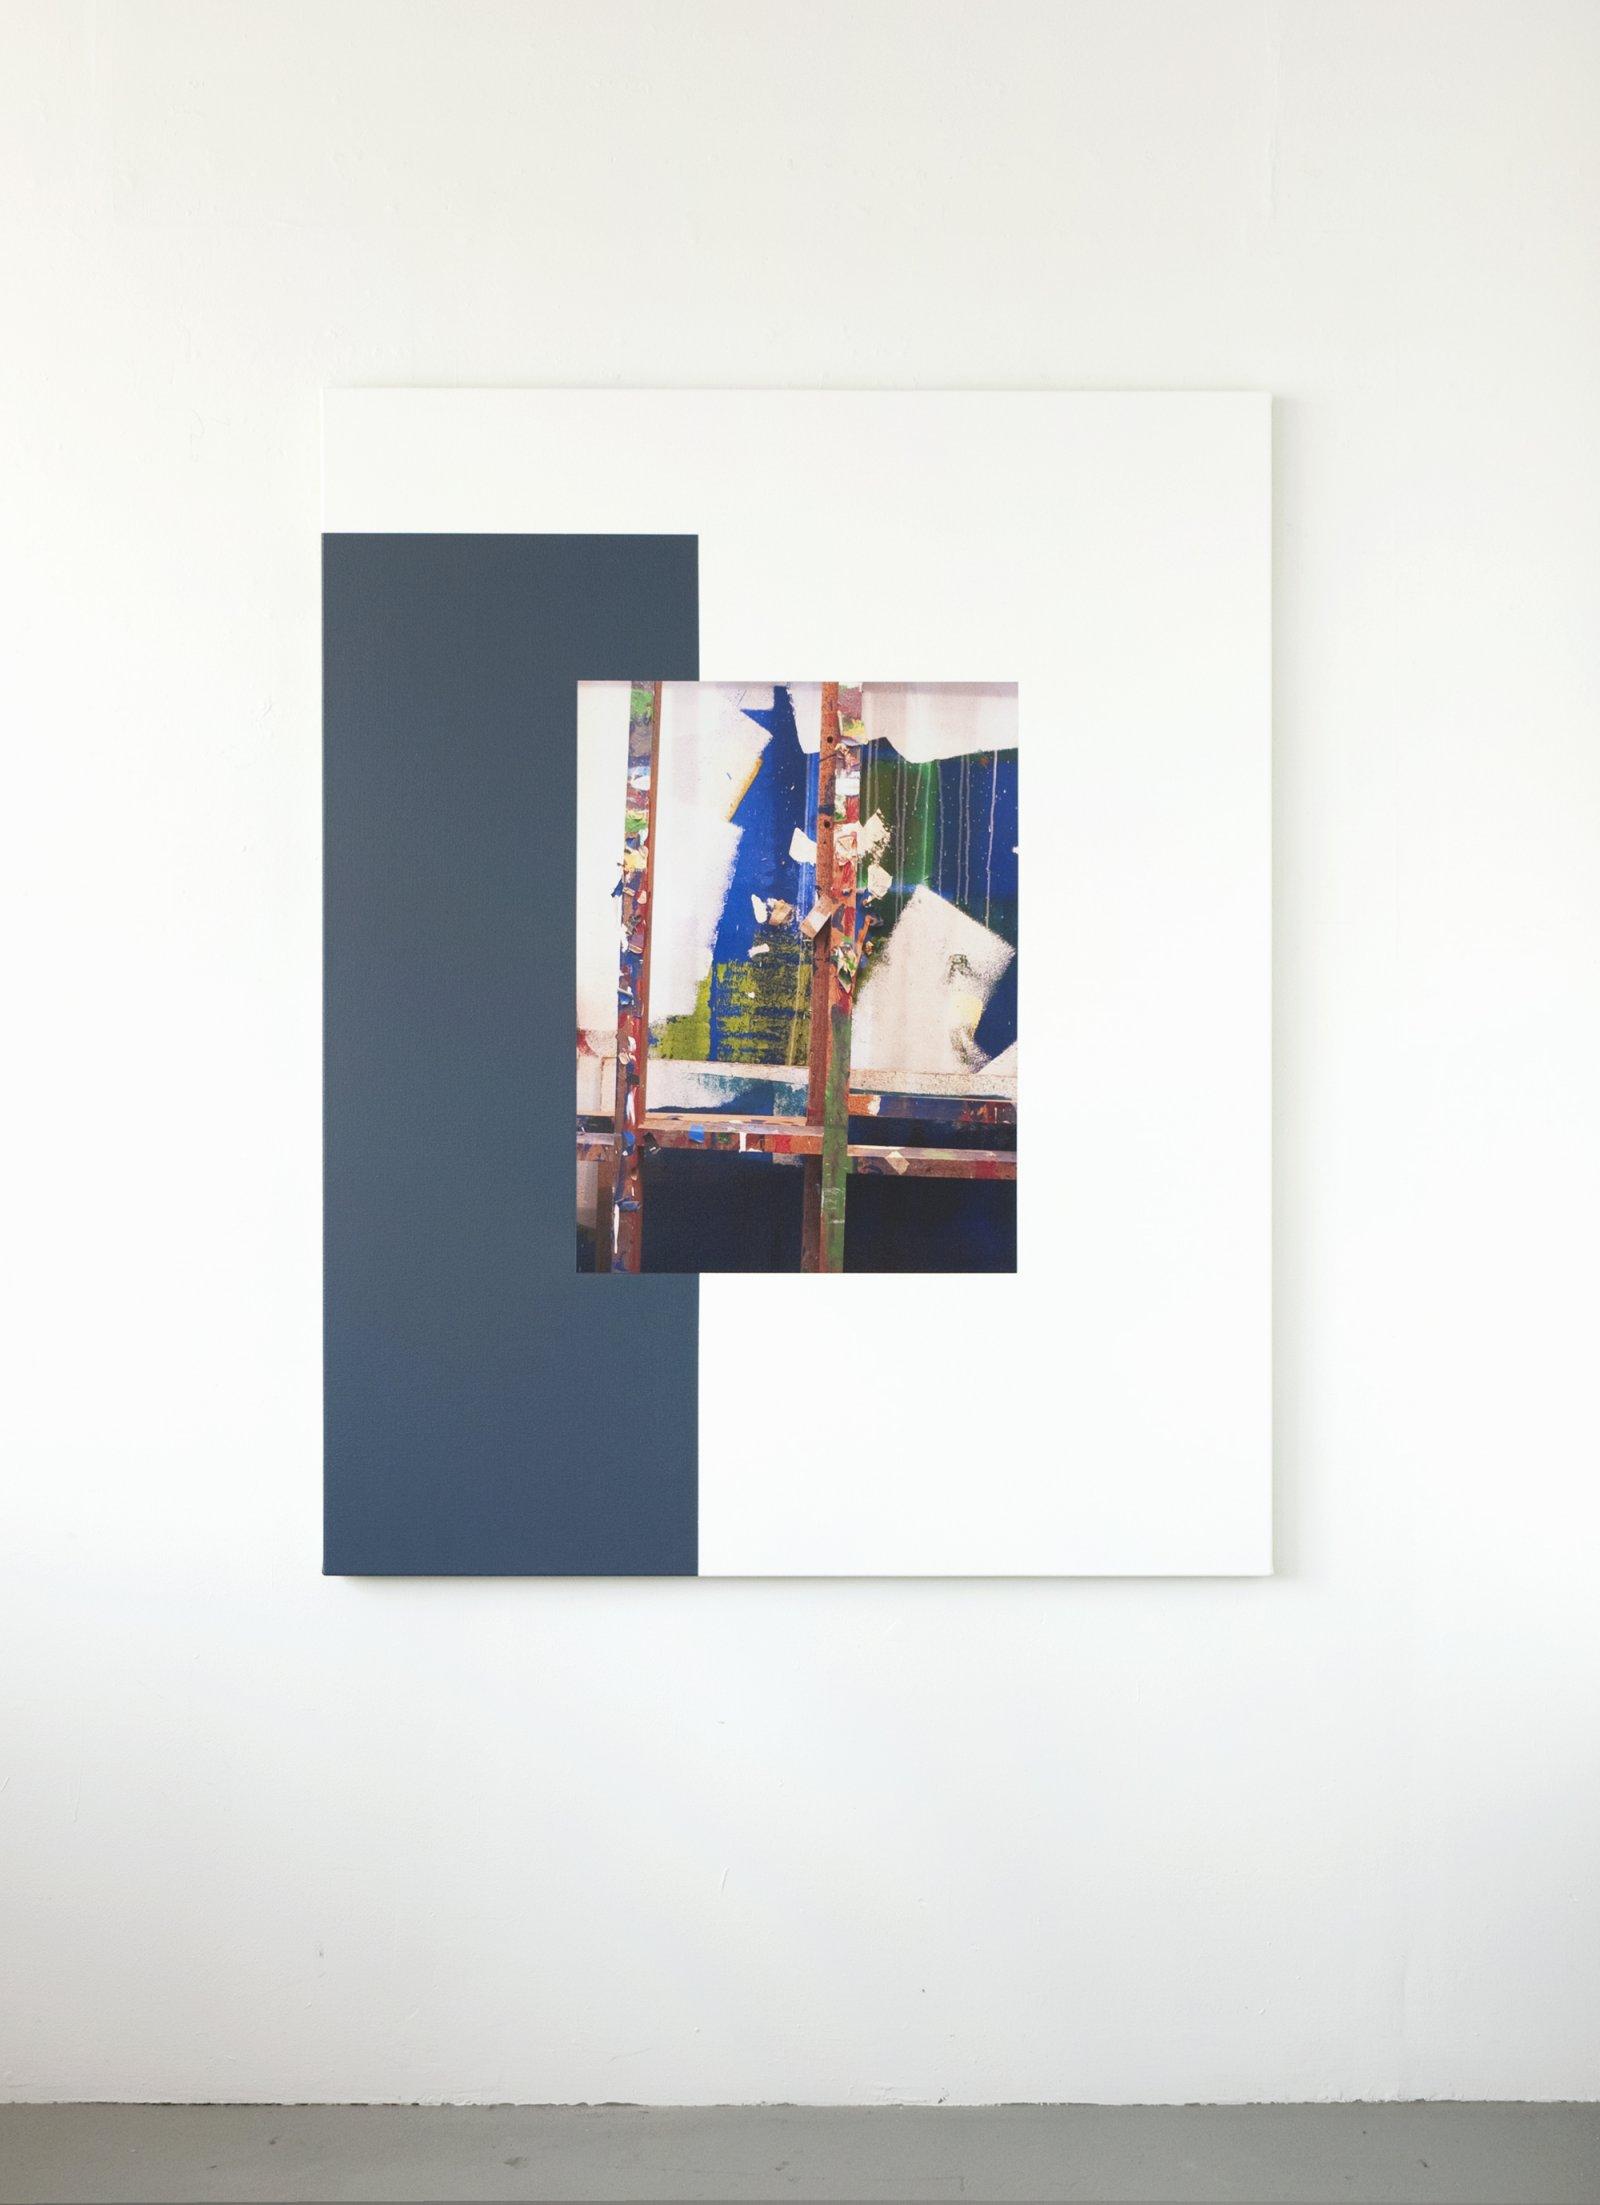 Ian Wallace,Les Traces de la Peinture (Molinari Series) II, 2012,photolaminate and acrylic on canvas, 60 x 48 in. (152 x 122 cm)